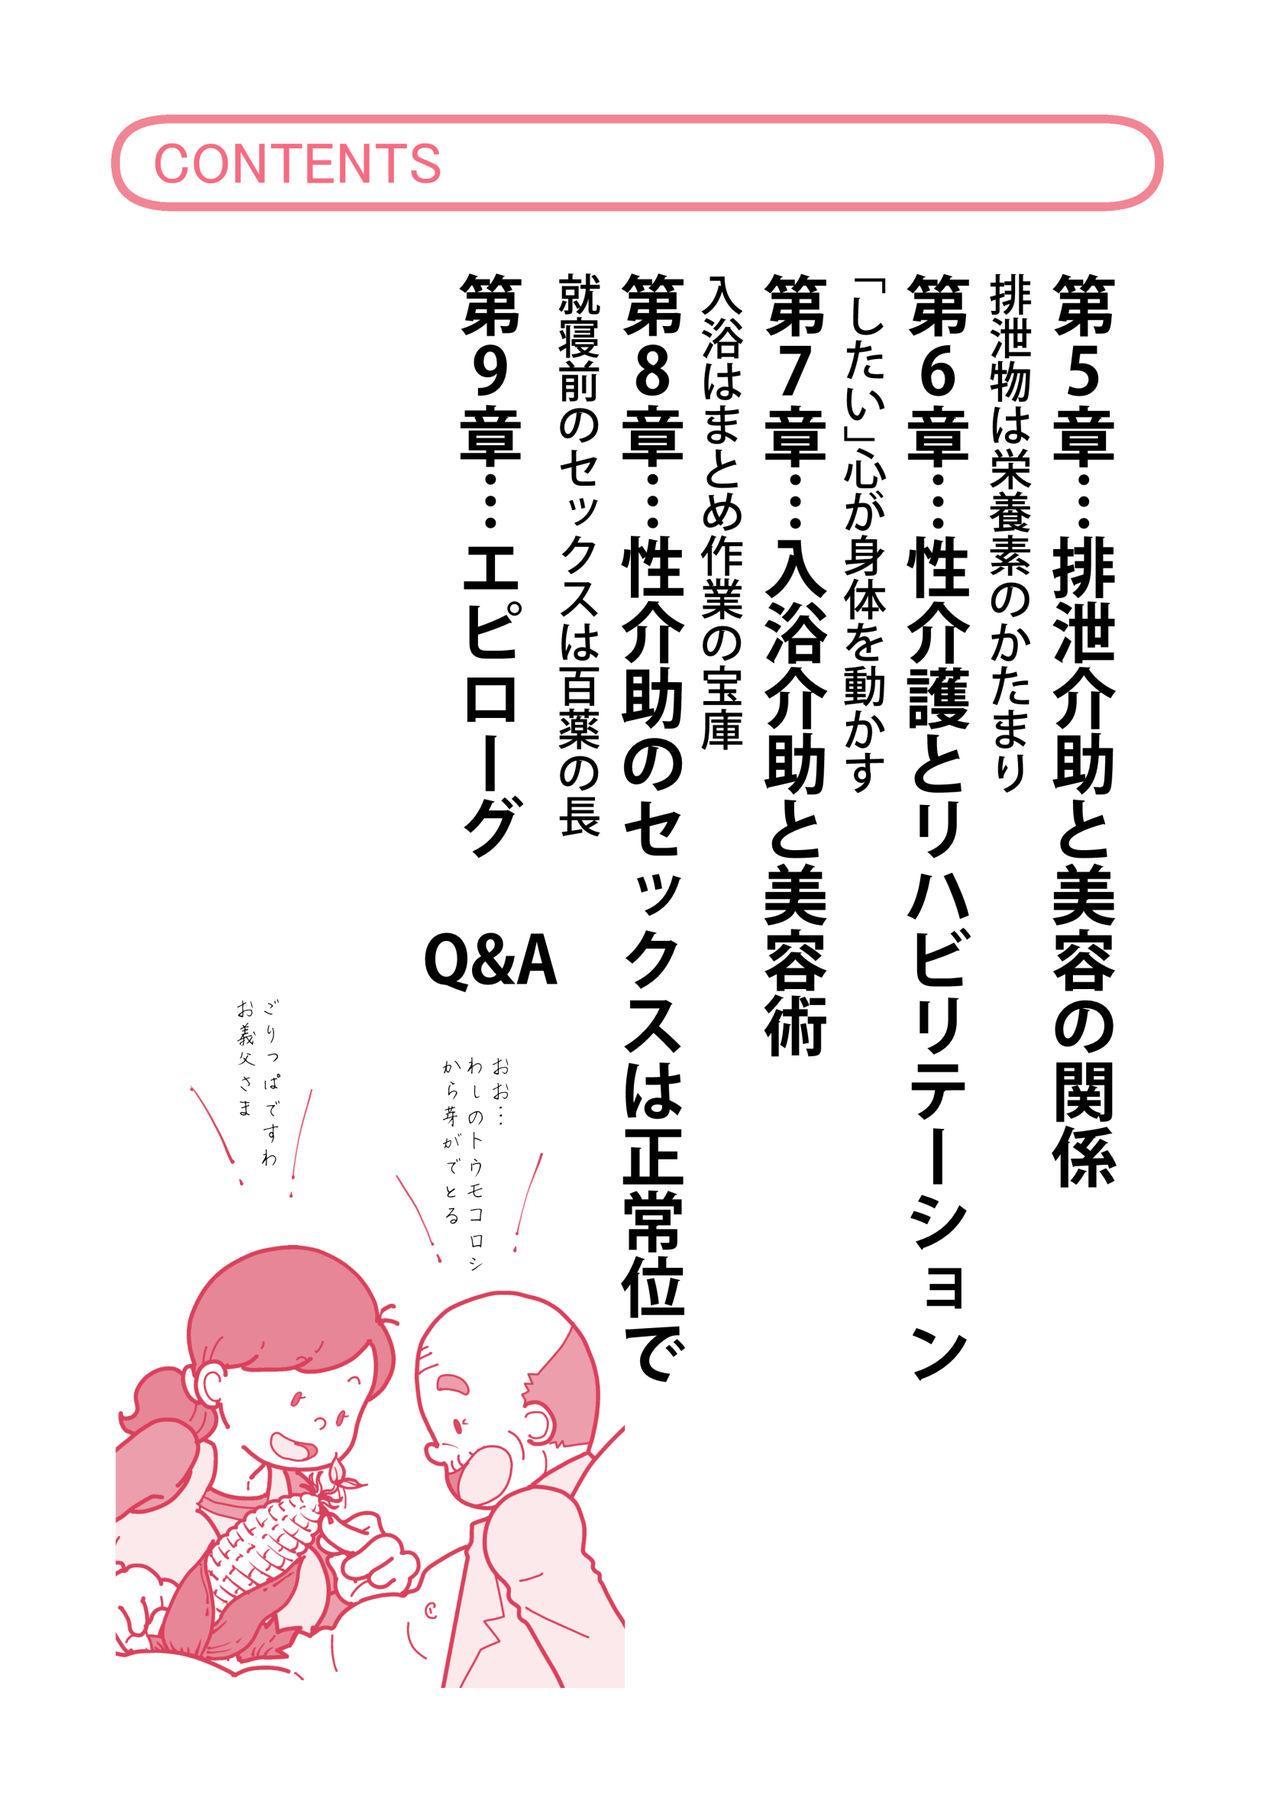 Isogasii Okaasan No Tamuno Sasa Rouzin Seikaigo | Guide for Elderly Sex Health Care to Busy Mom 6